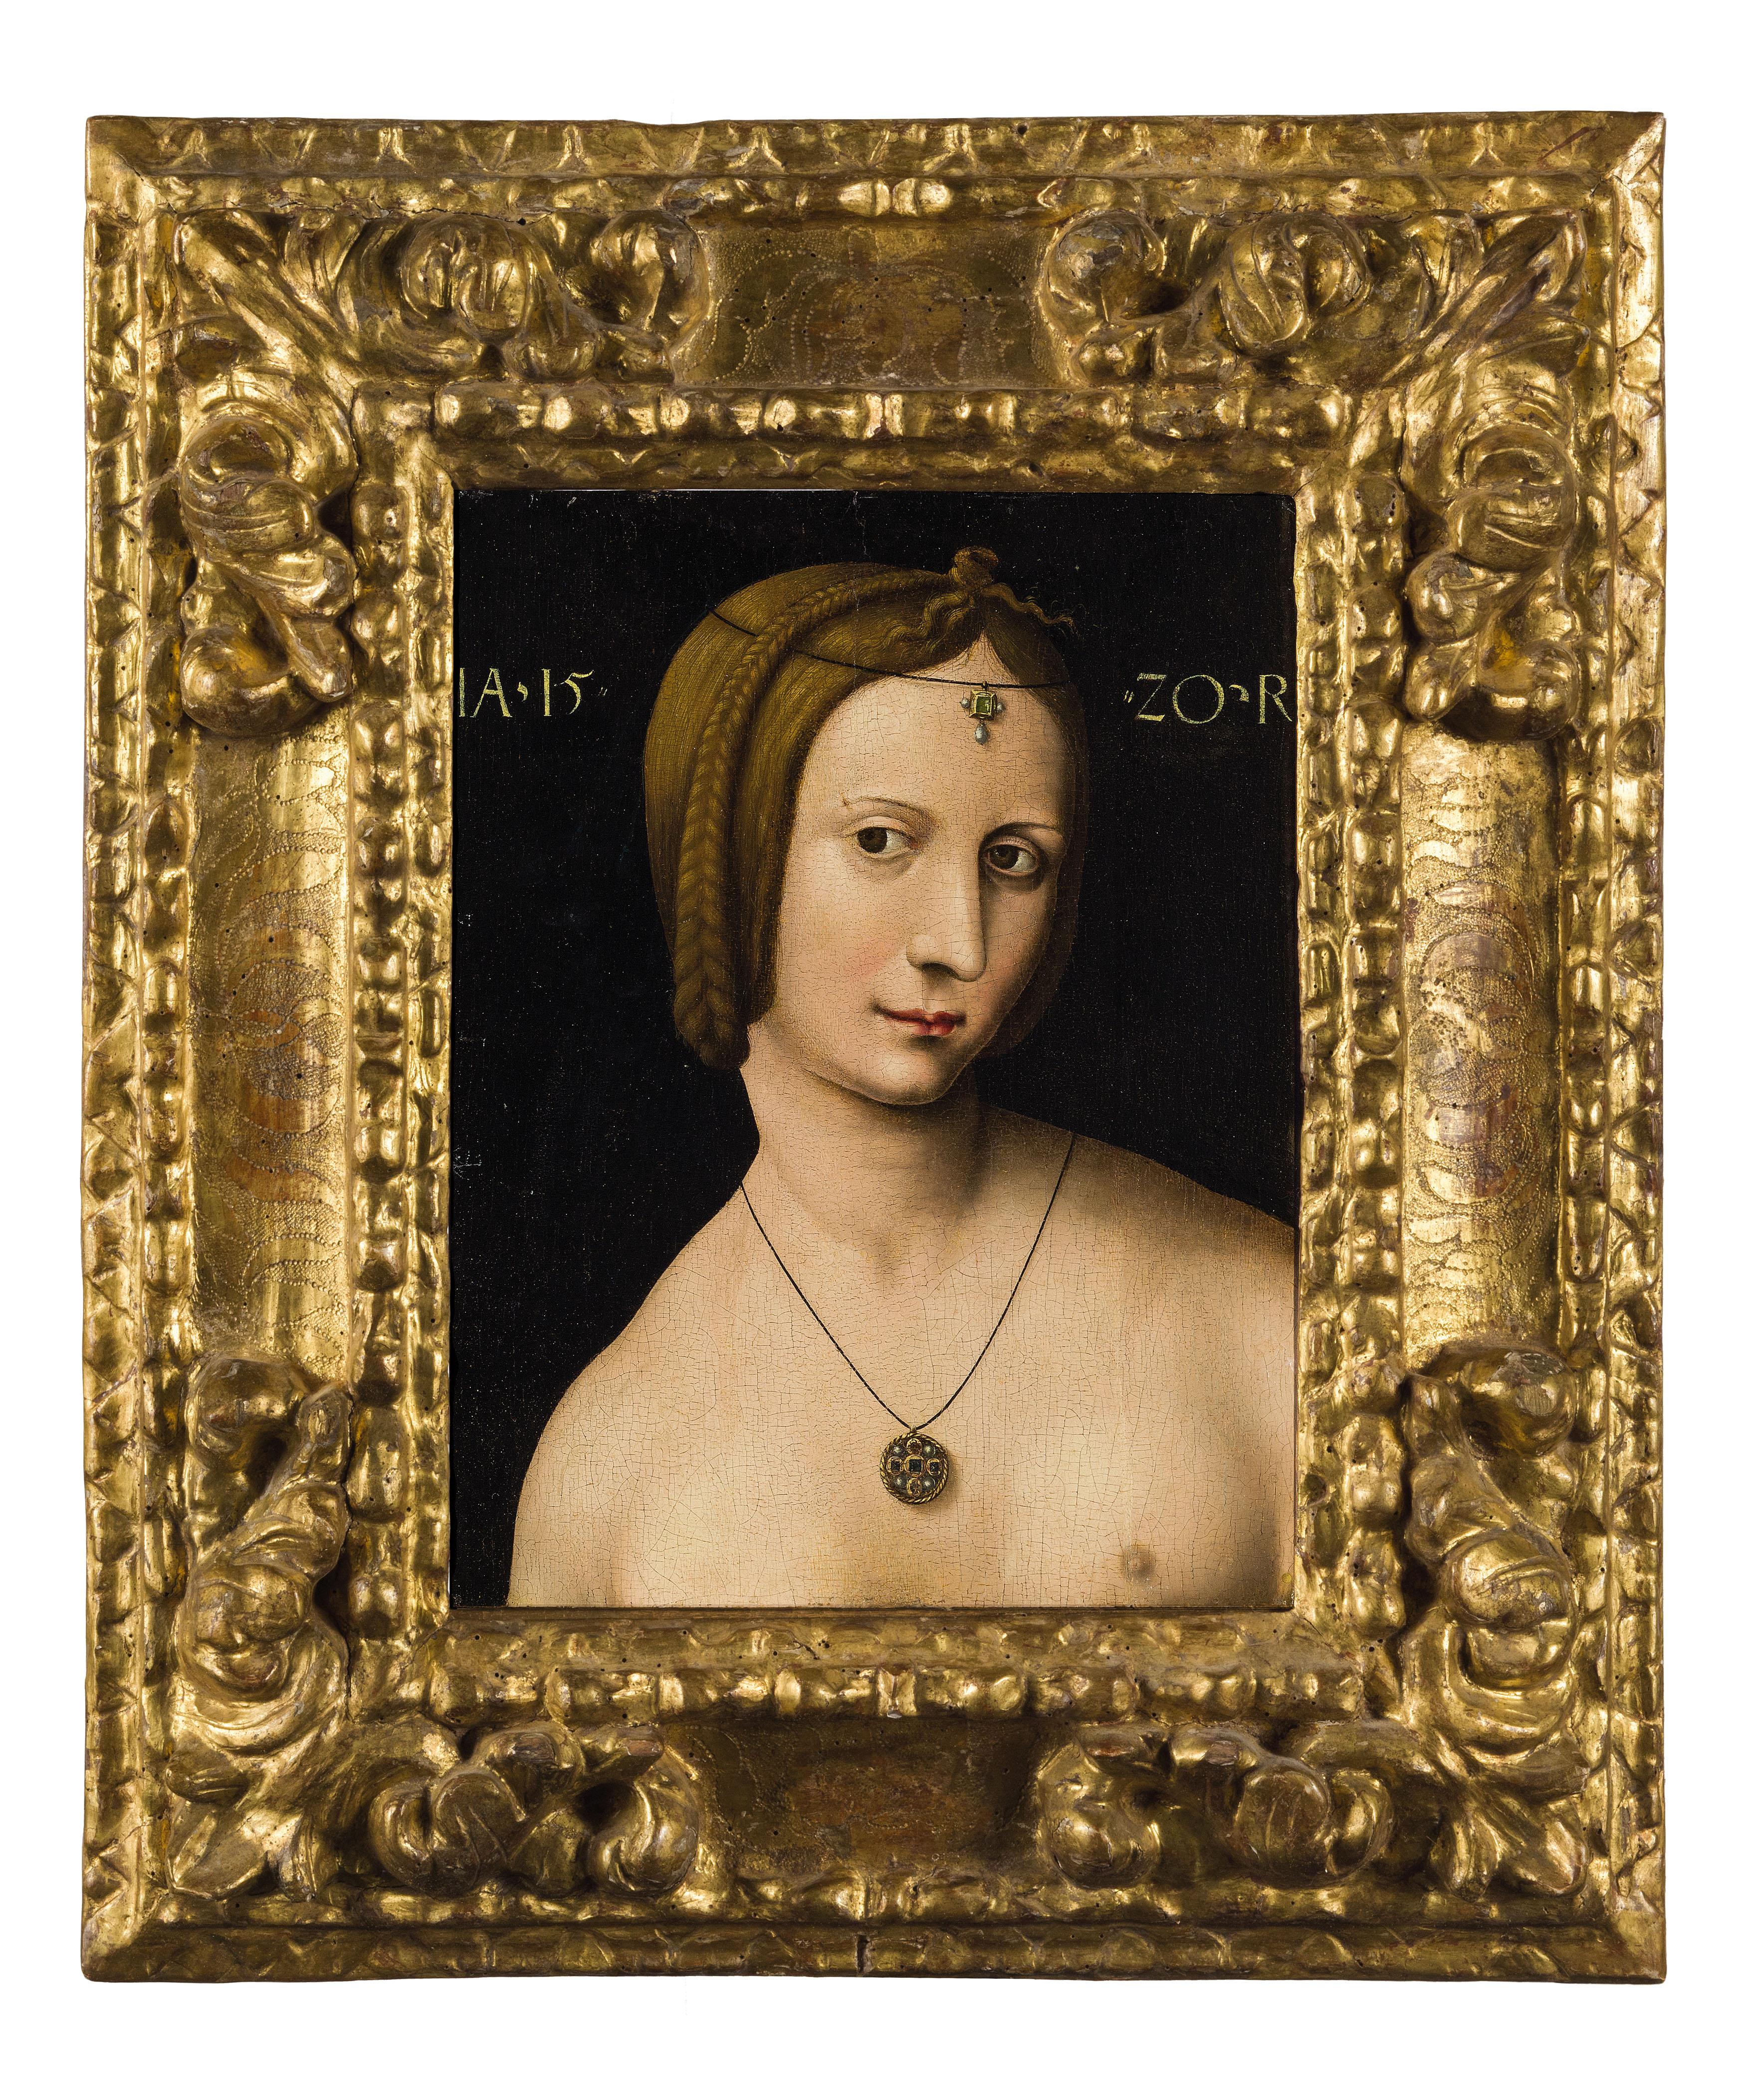 AMBROSIUS BENSON (1495/1500 Lombardei - 1550 Brügge) - Weibliche Figur, Öl/Lwd., 1520